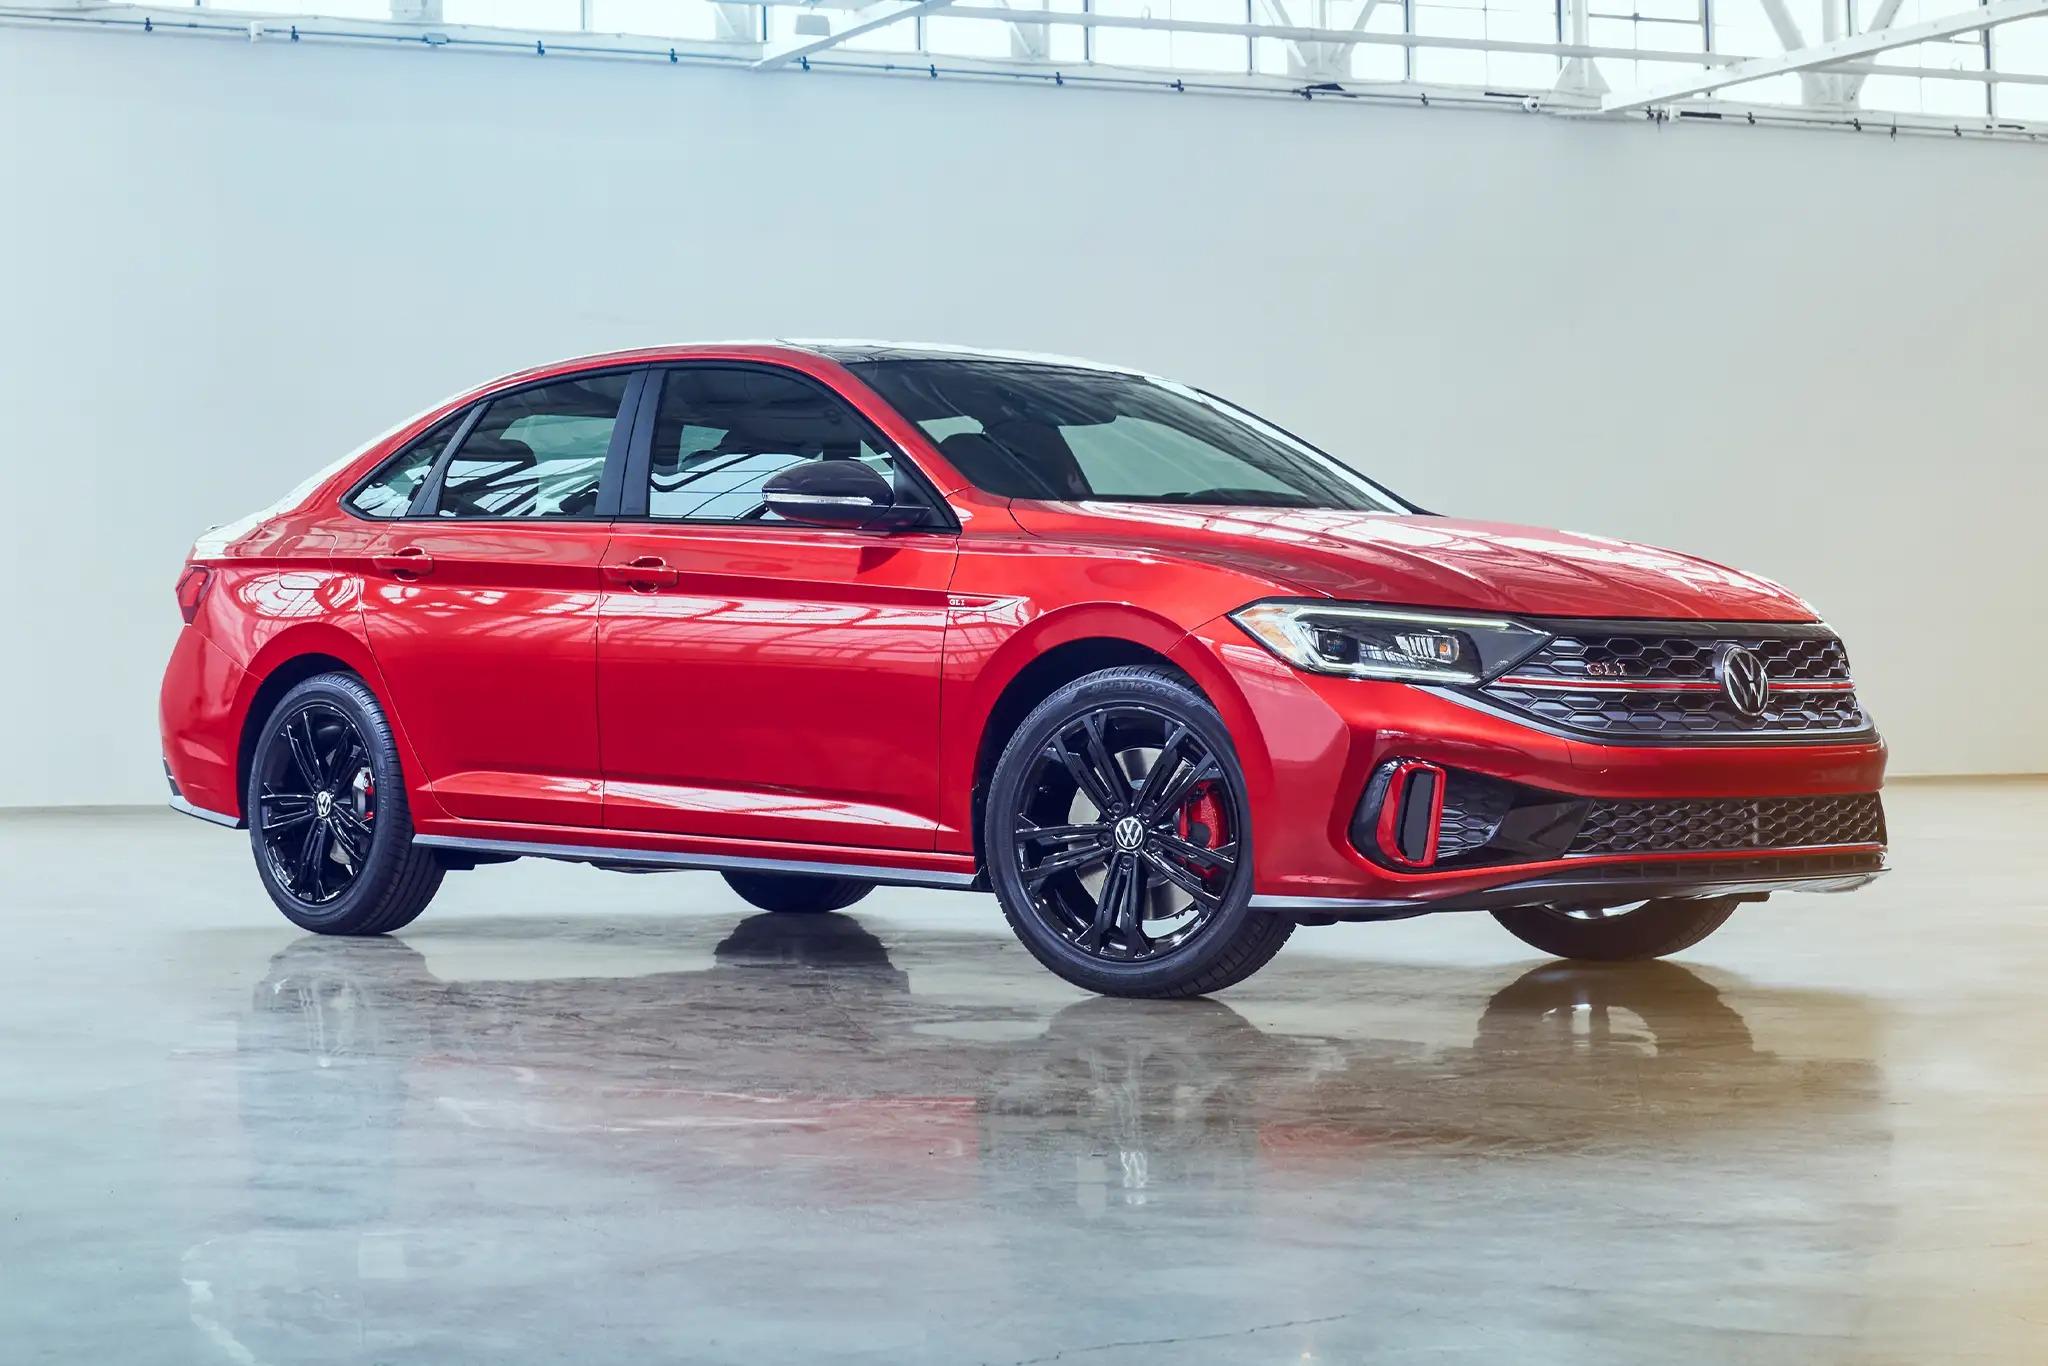 Volkswagen Jetta GLI deve chegar em breve ao mercado brasileiro